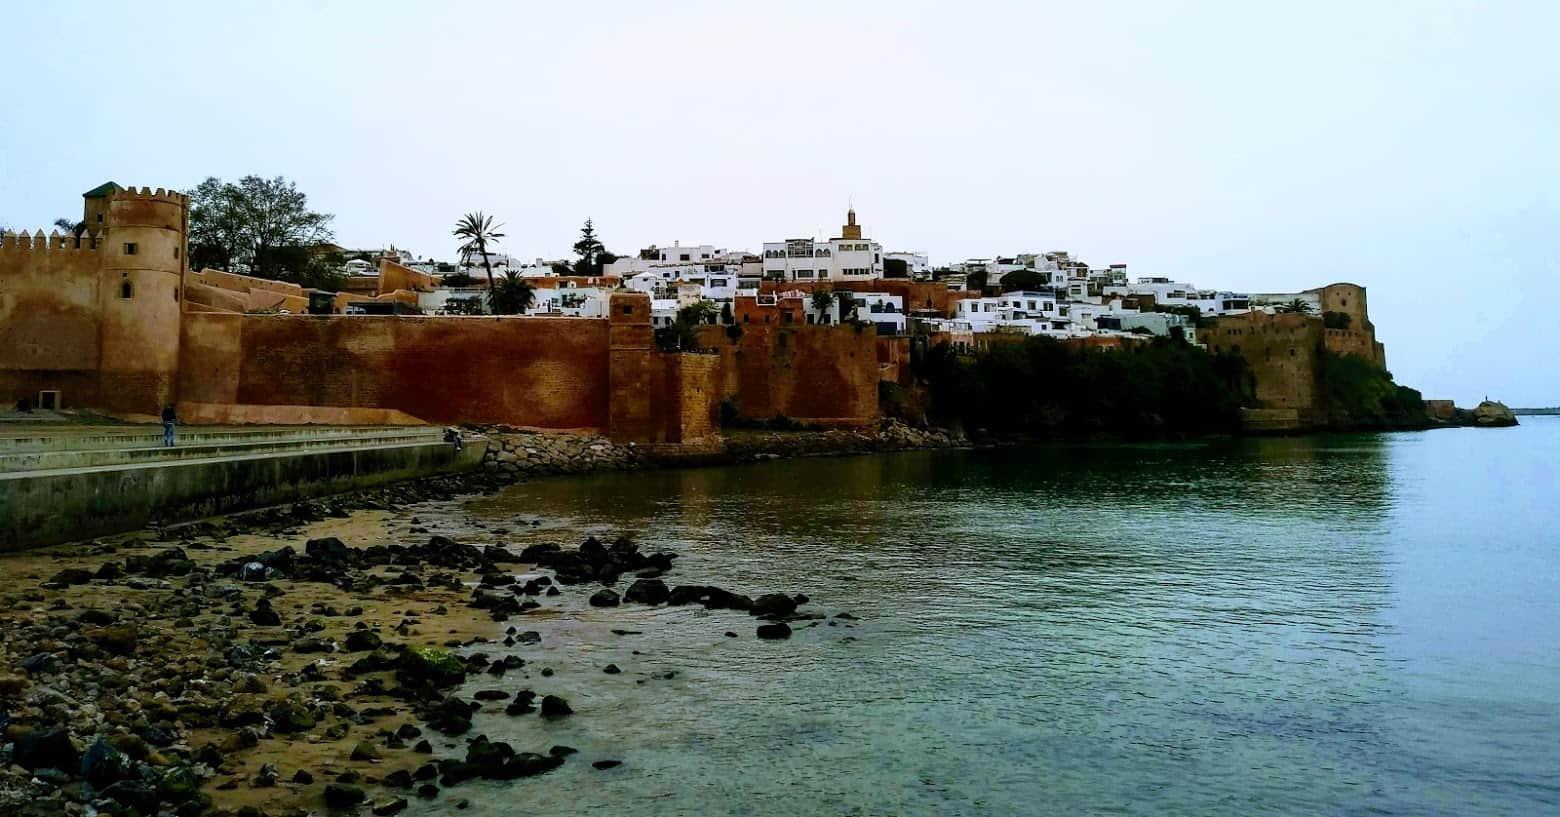 The Kasbah des Oudaias in Rabat seen from the river Bou Regreg. Photo credit: Mac Dressman.